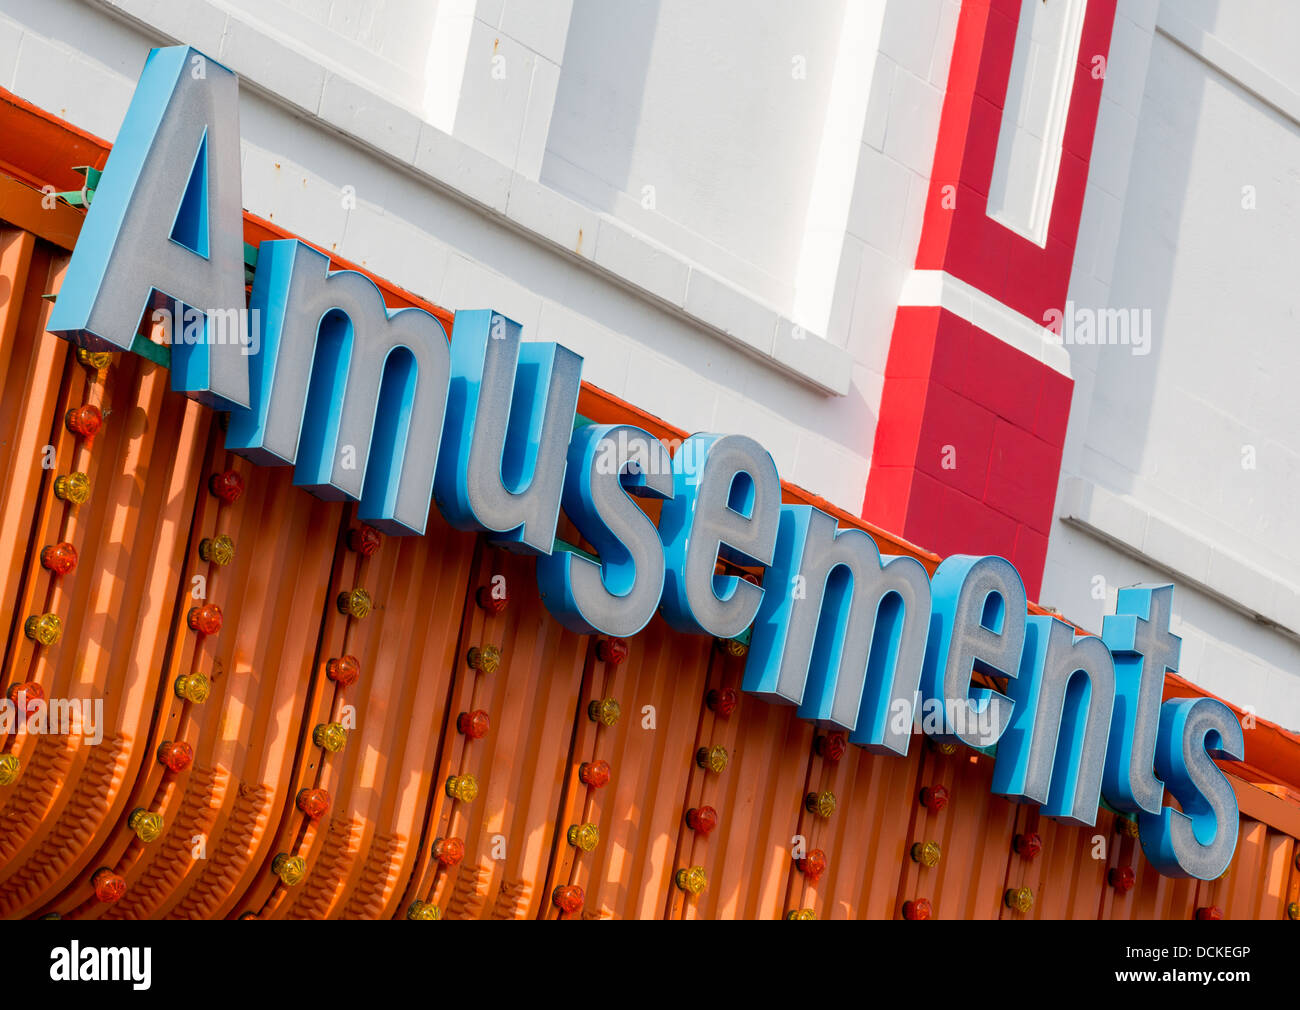 19/08/2013 Amusements, arcade sign, Southend-on-sea - Stock Image